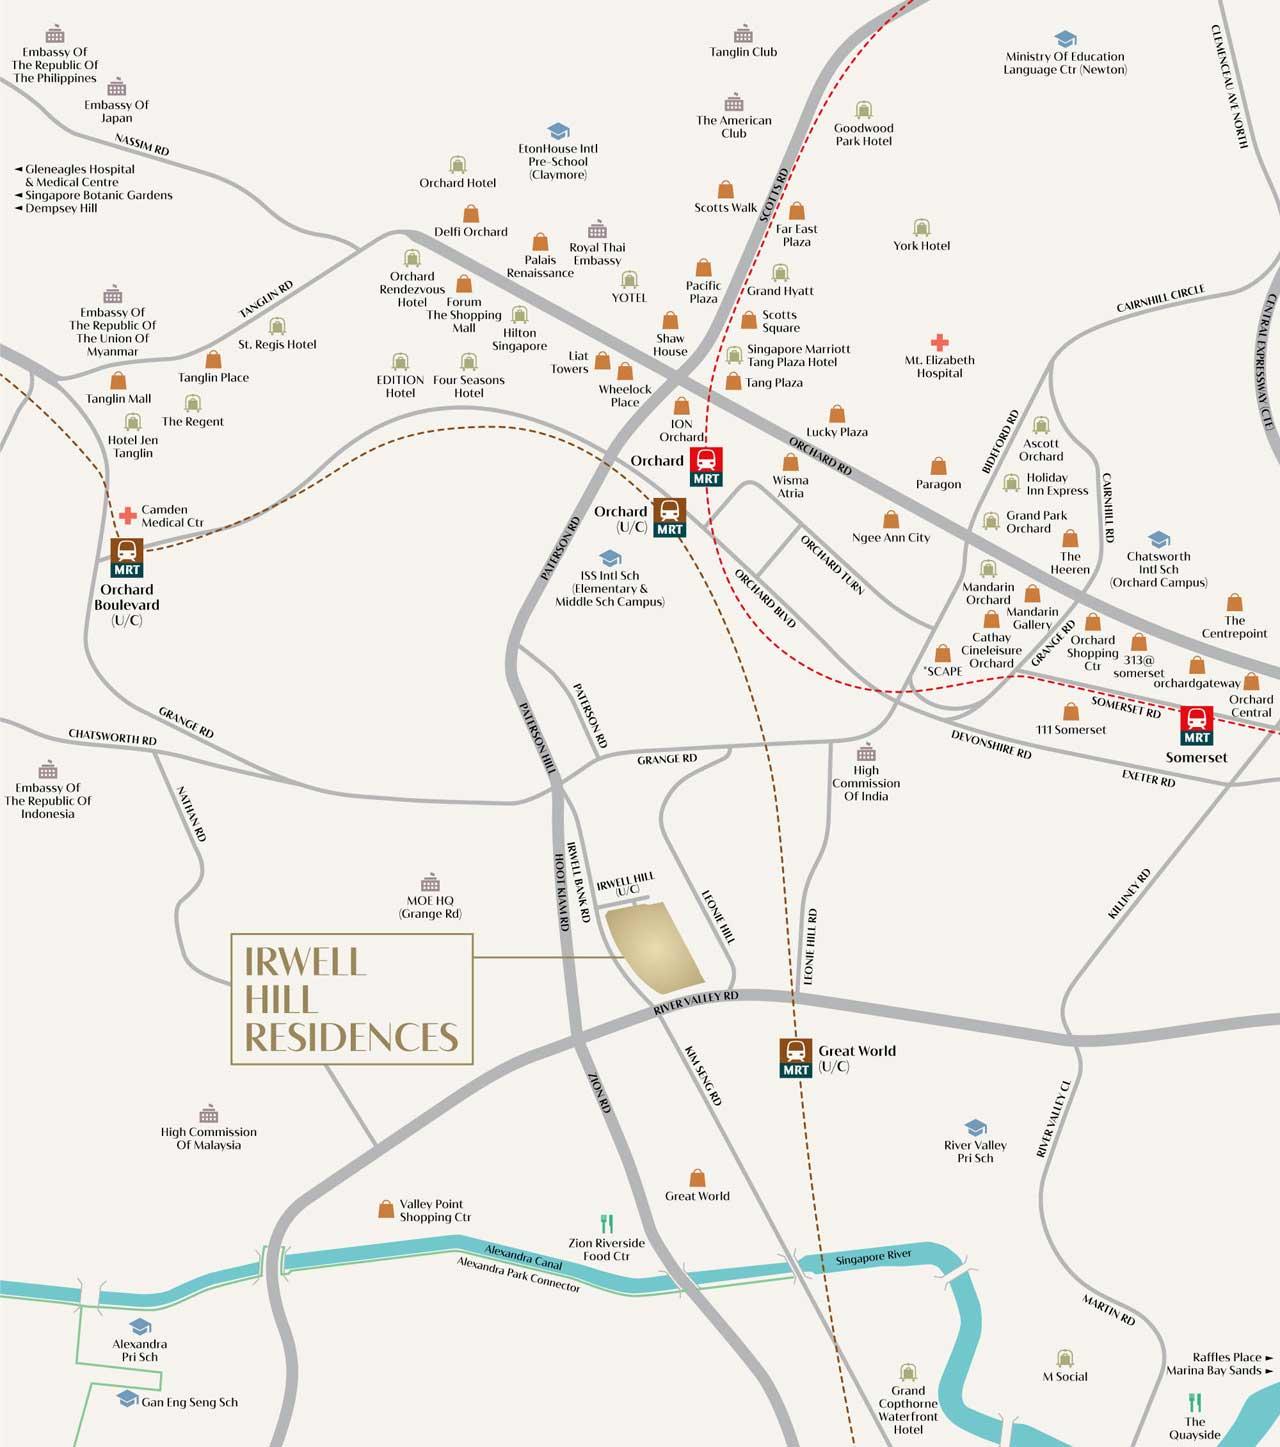 Irwell Hill Residences Location